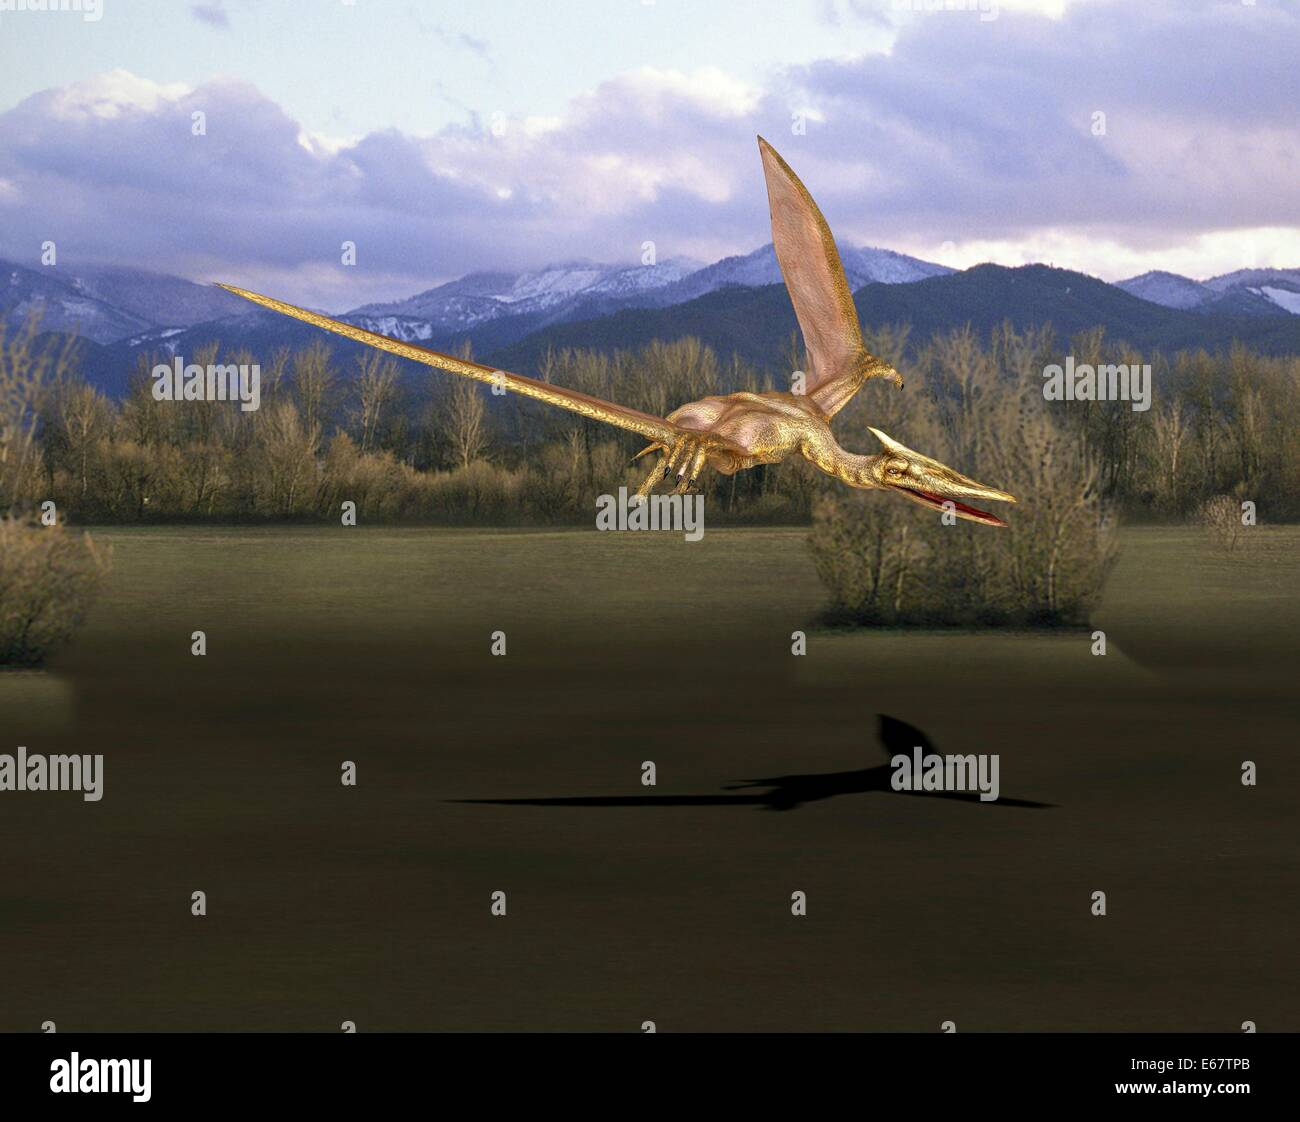 Dinosaurier Quetzalcoatlus / dinosaur Quetzalcoatlus - Stock Image